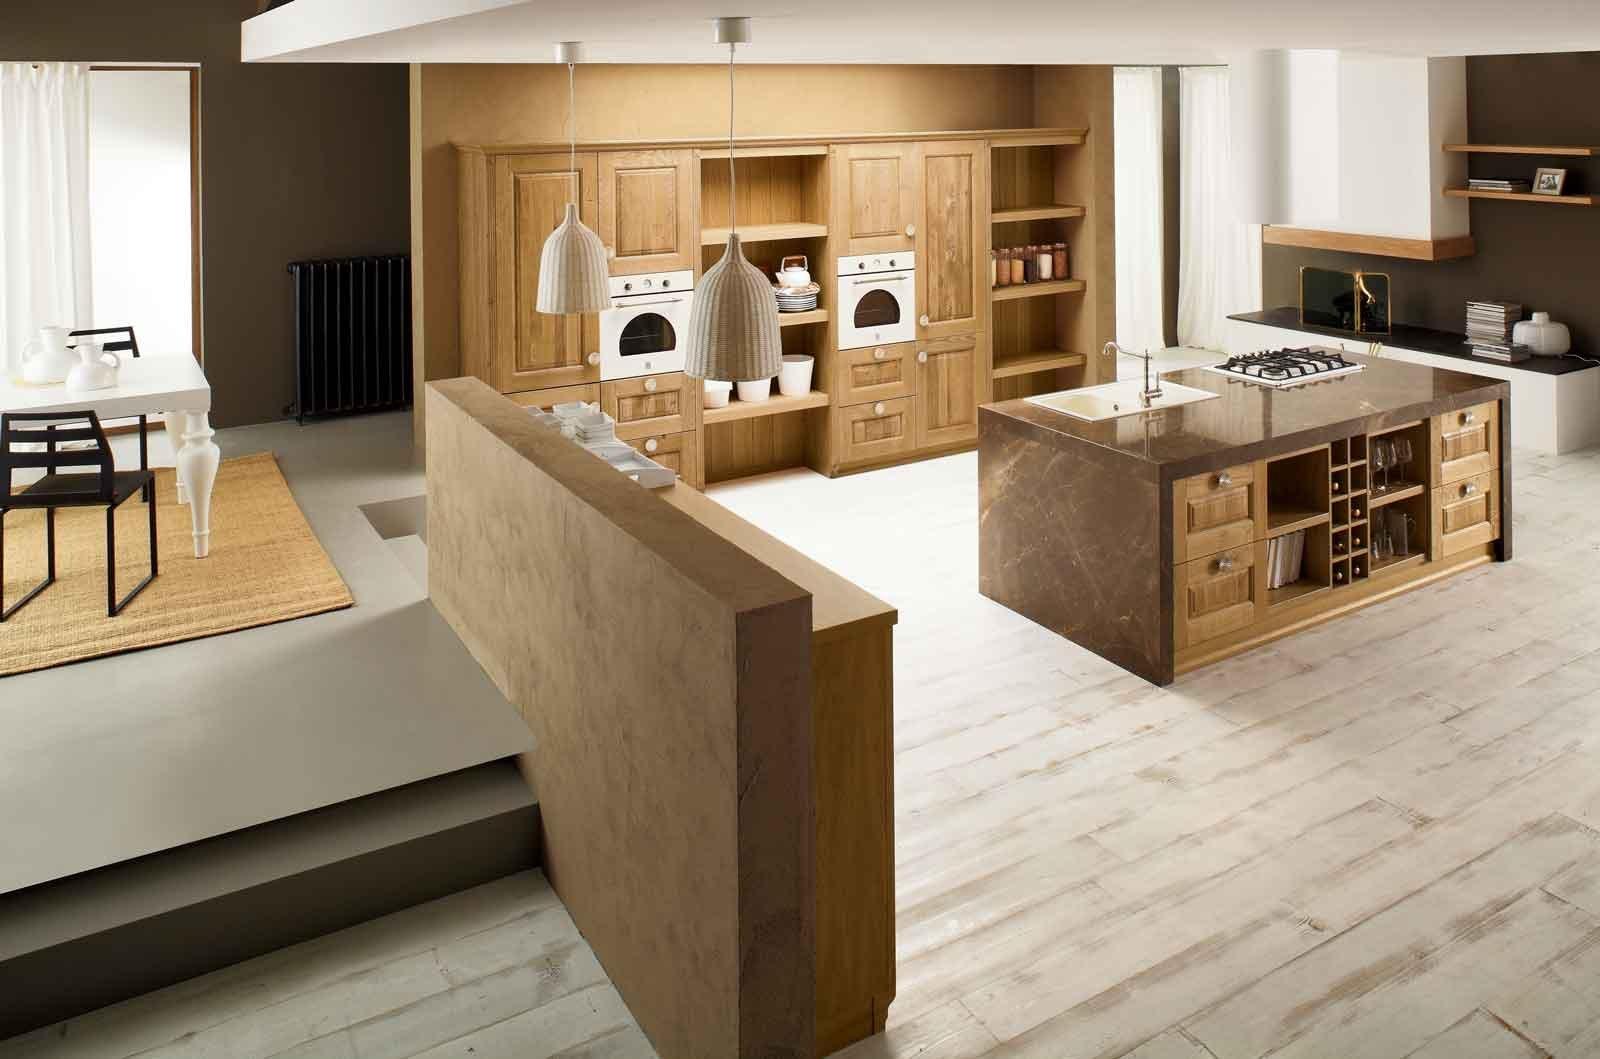 Cucina Con Boiserie : Cucine con elementi a boiserie cose di casa